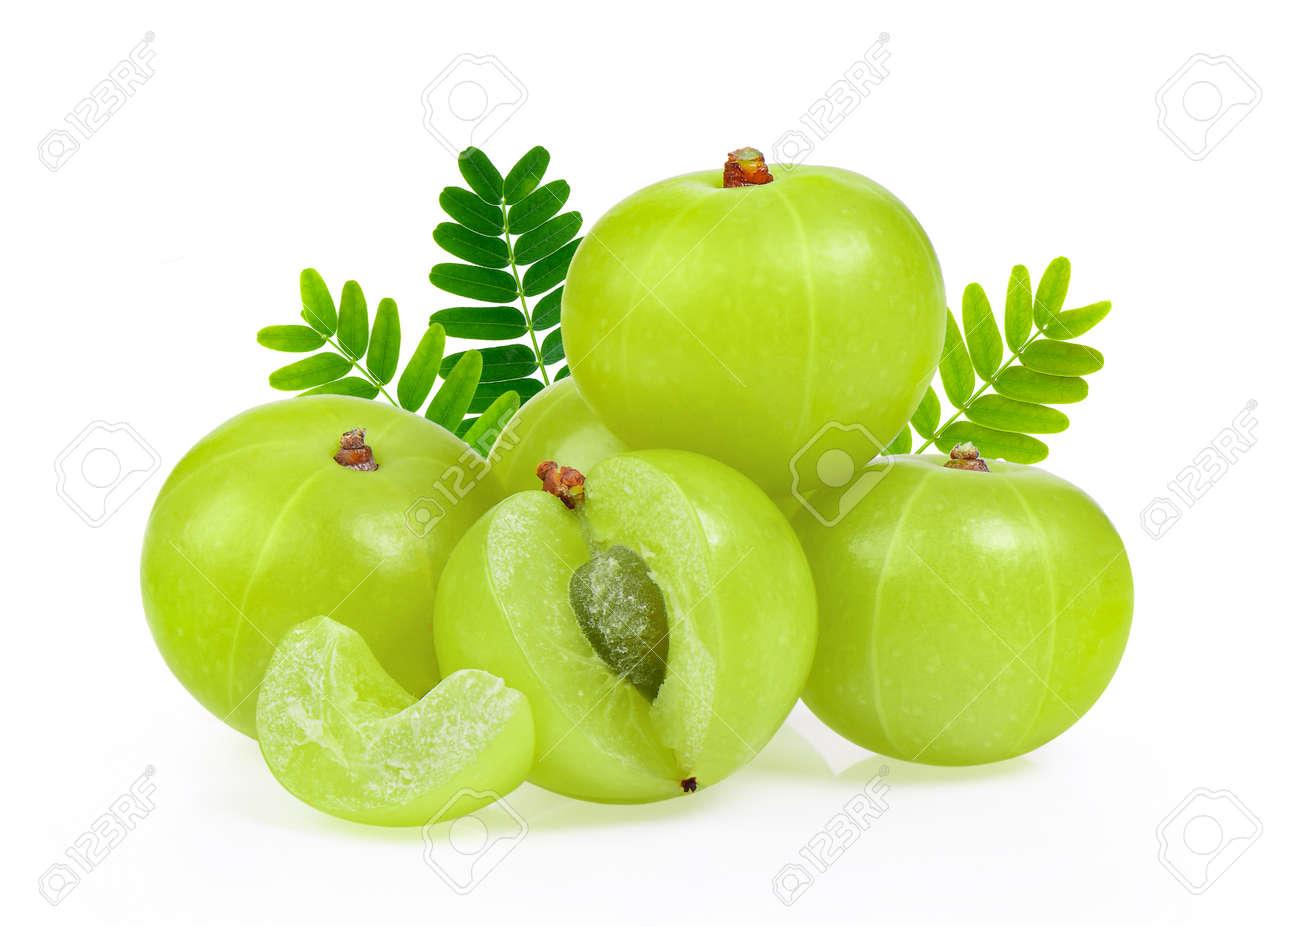 Indian gooseberry isolated on white background - 108885064